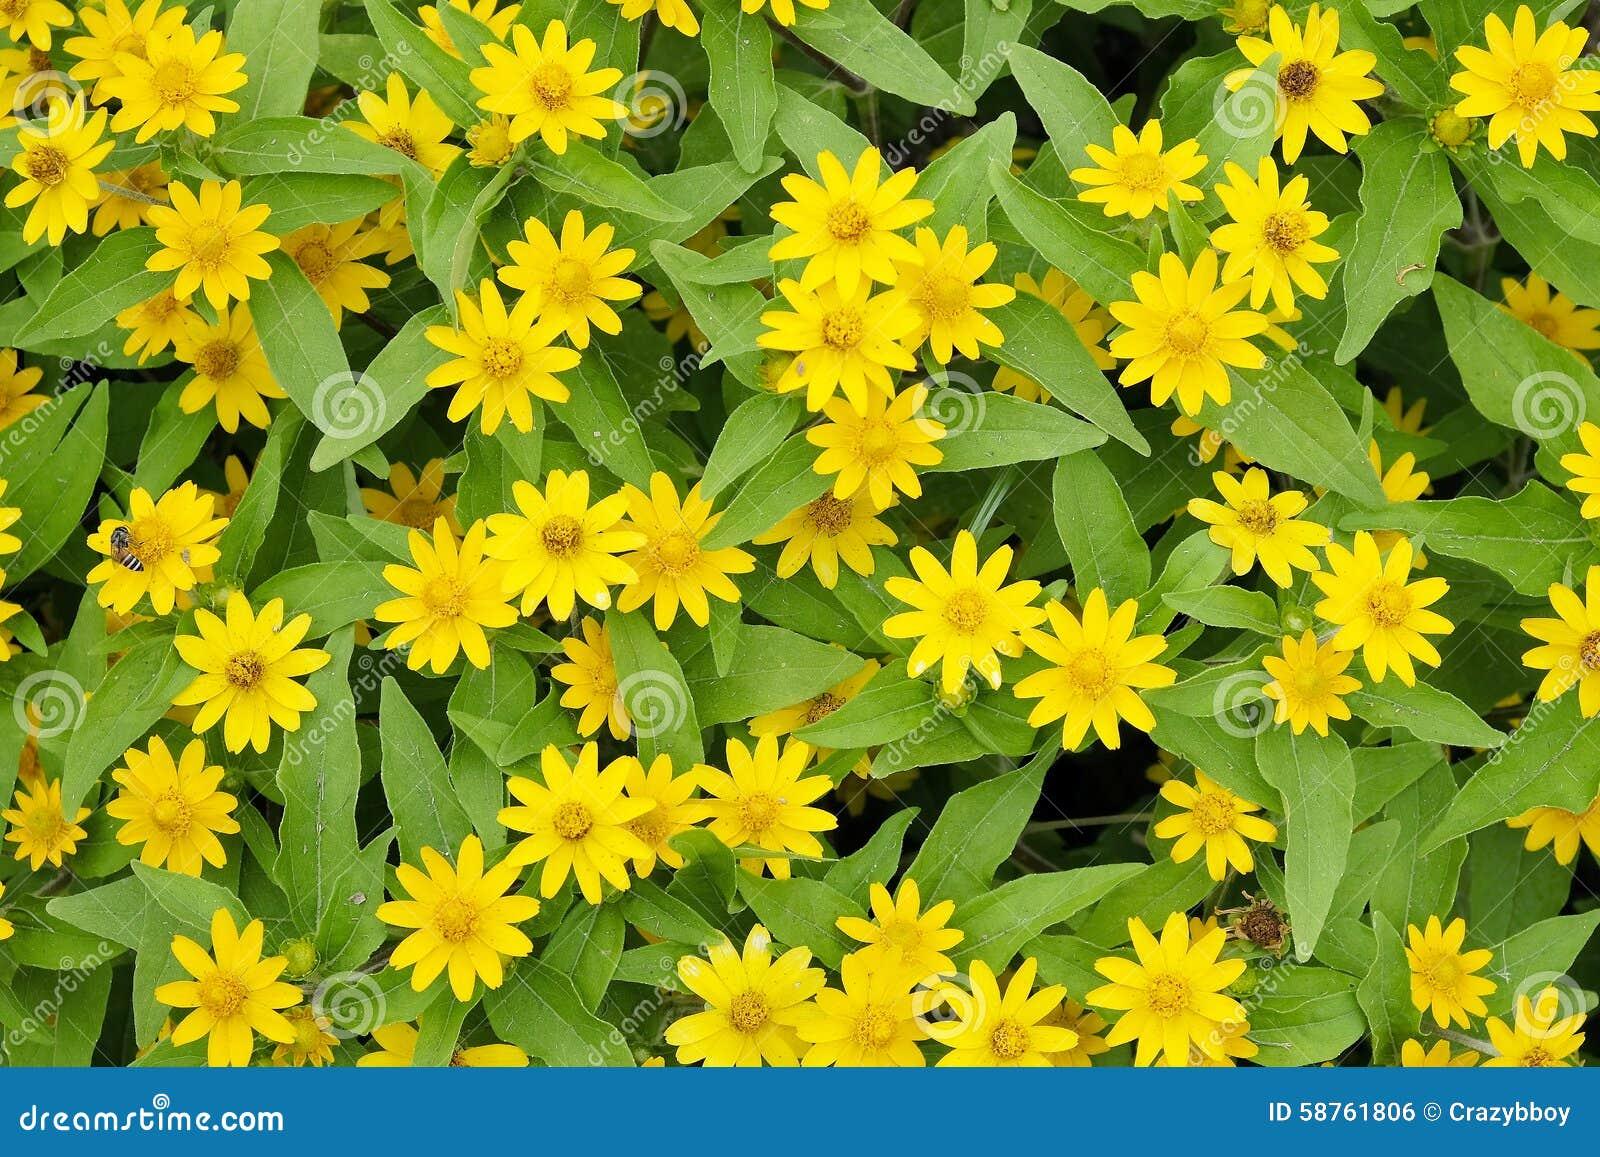 Background of small yellow flowers stock photo image of flower download background of small yellow flowers stock photo image of flower elegance 58761806 mightylinksfo